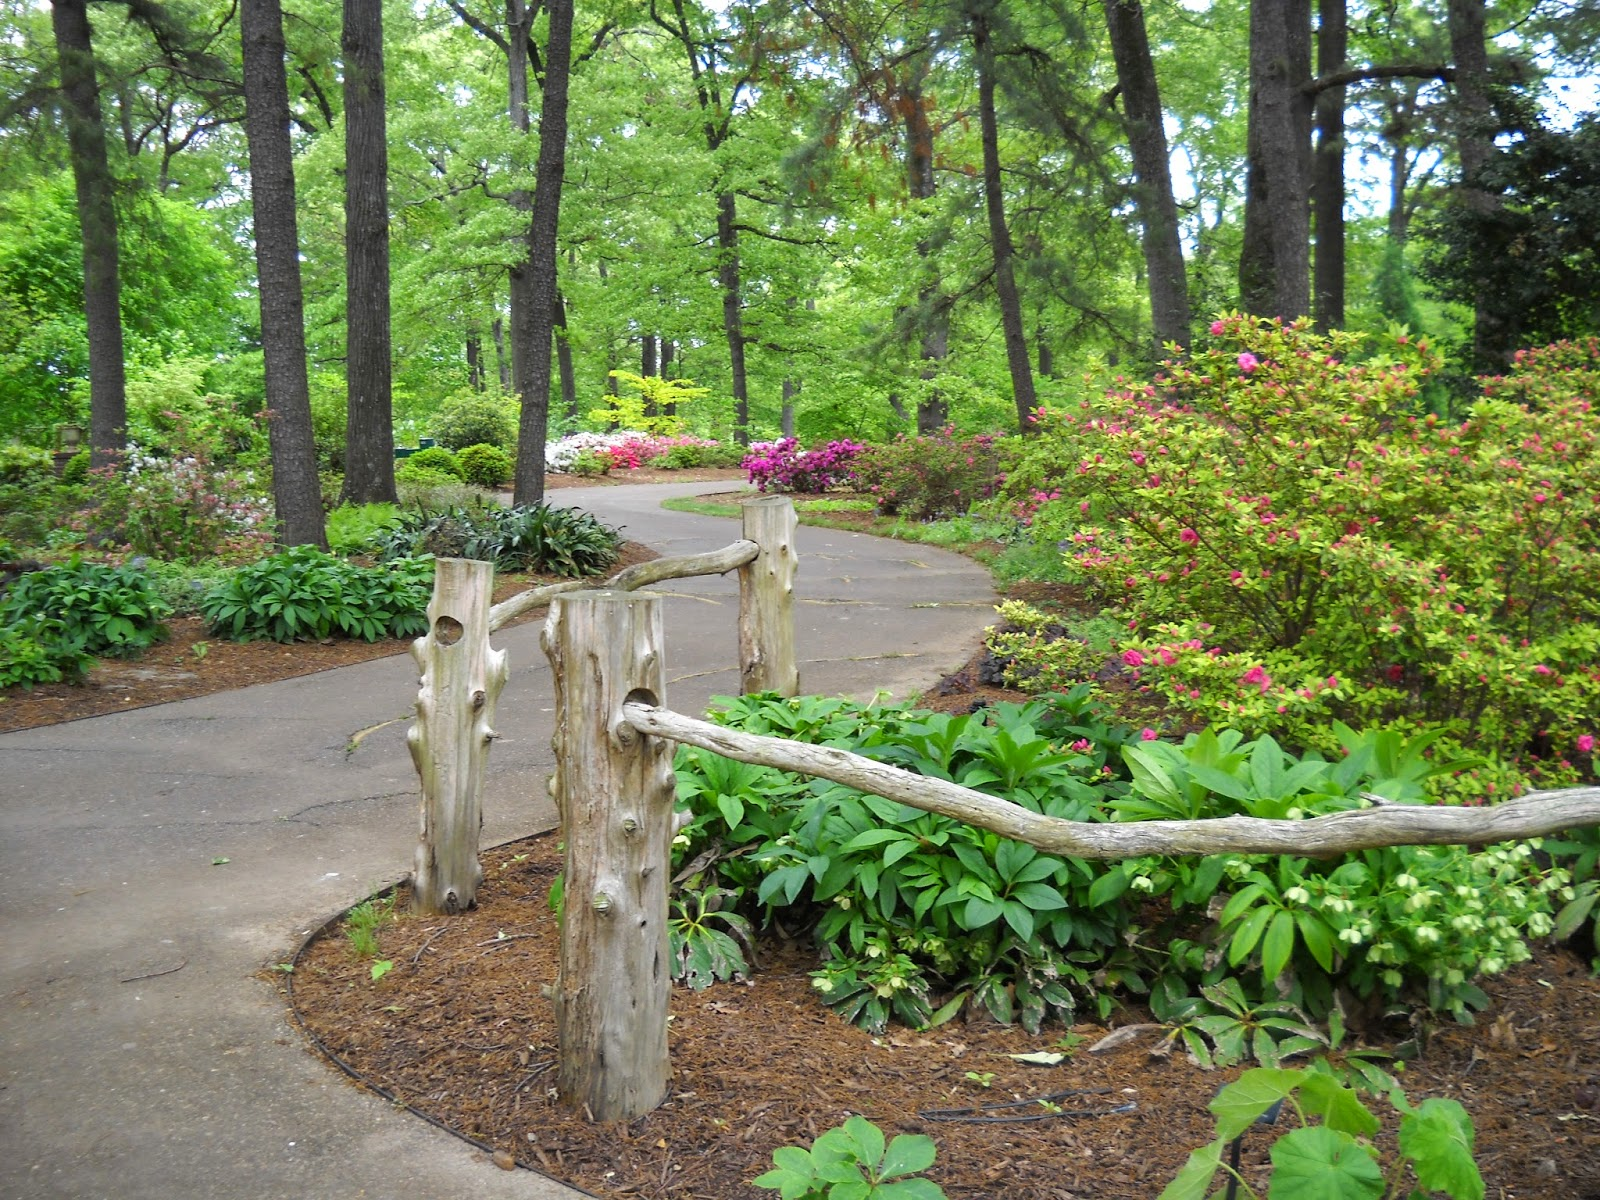 Divers and sundry memphis botanic garden azaleas for Garden trees memphis